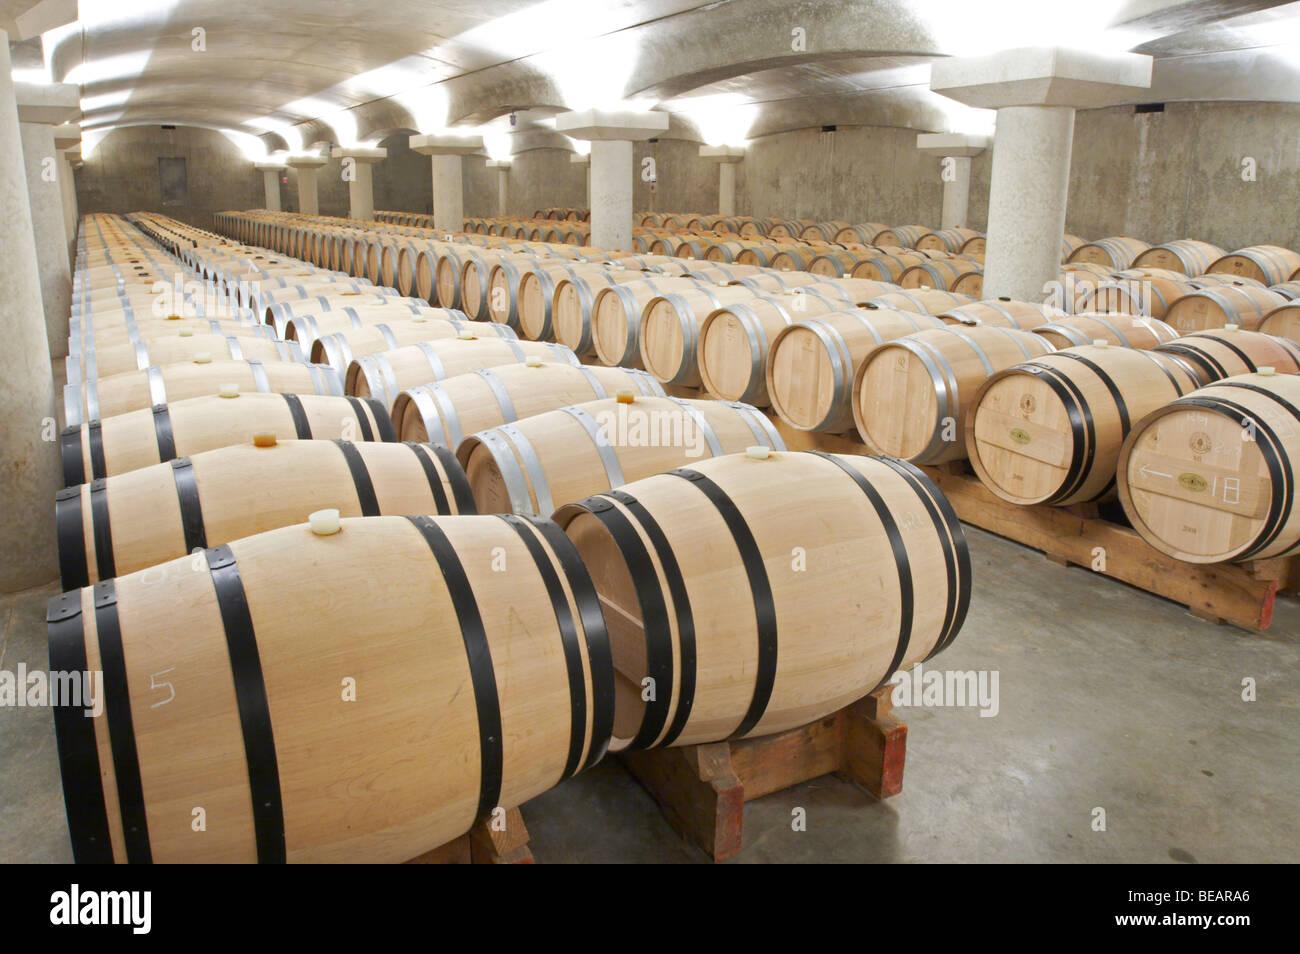 L Barrel Stockfotos & L Barrel Bilder - Alamy